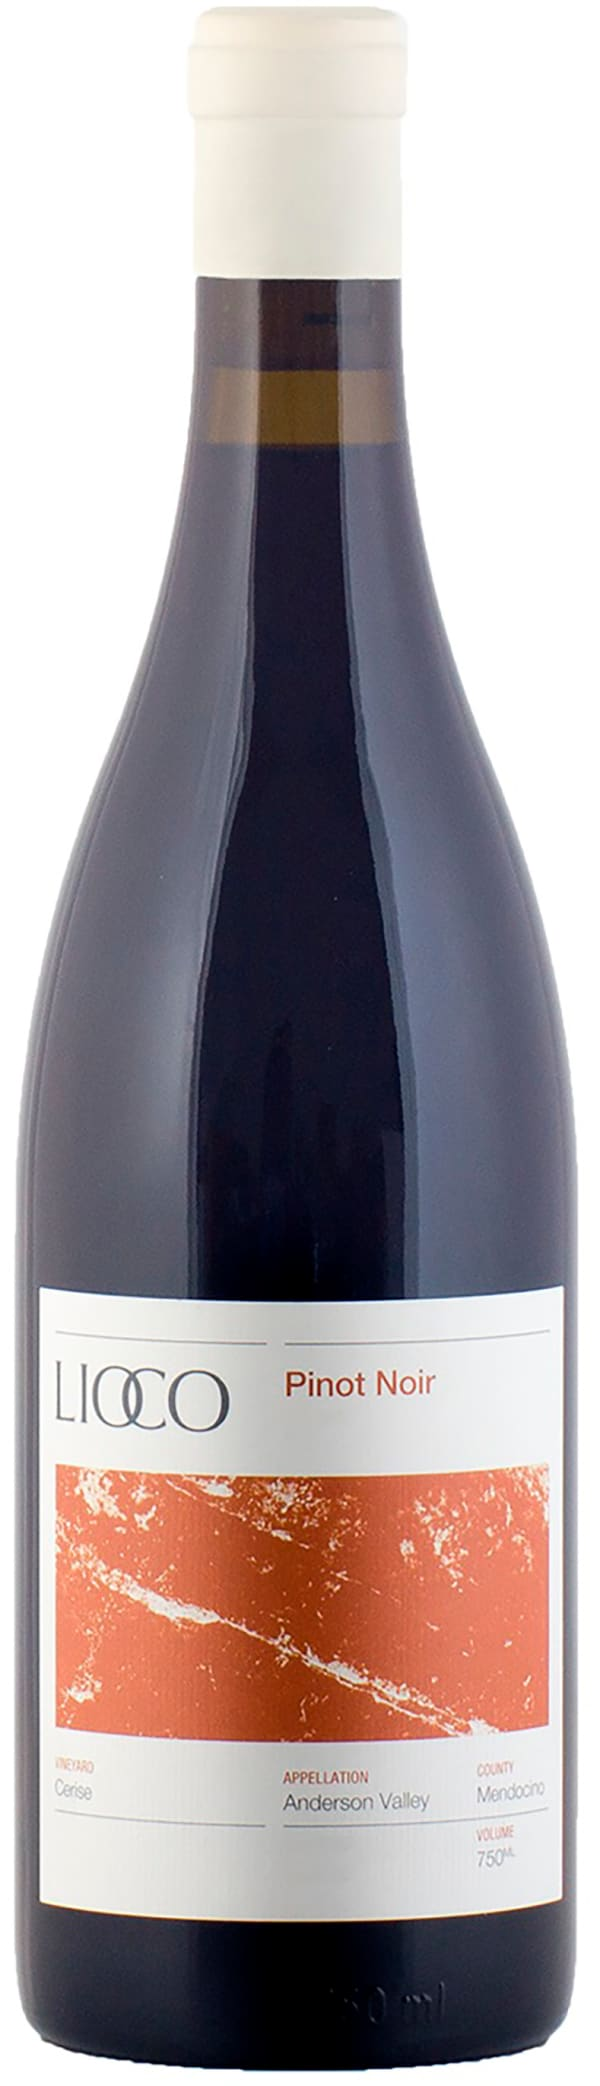 Lioco Cerise Vineyard Pinot Noir 2016